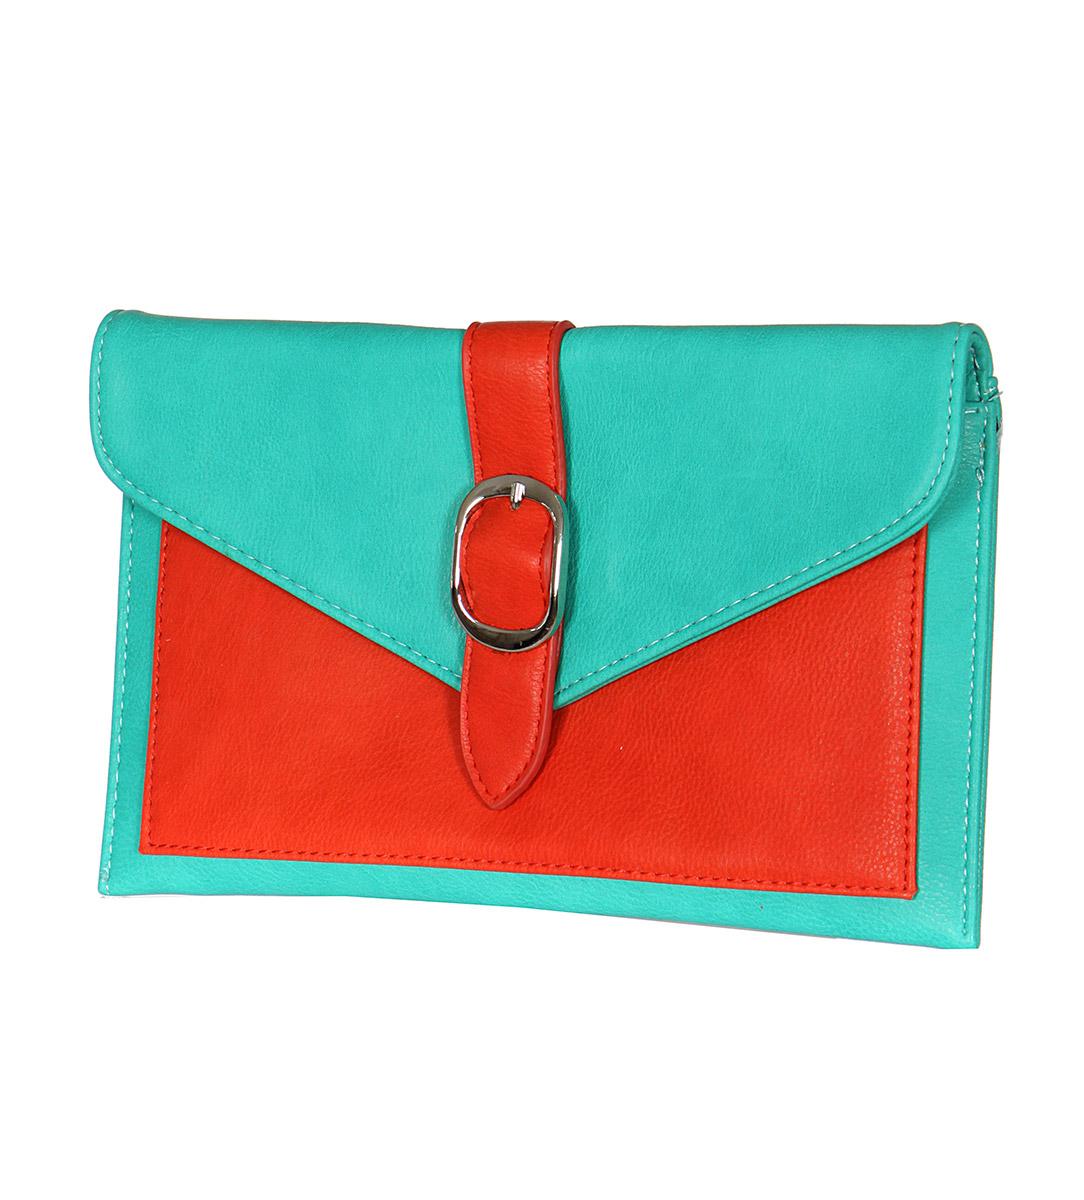 BELT BUCKLE clutch bag